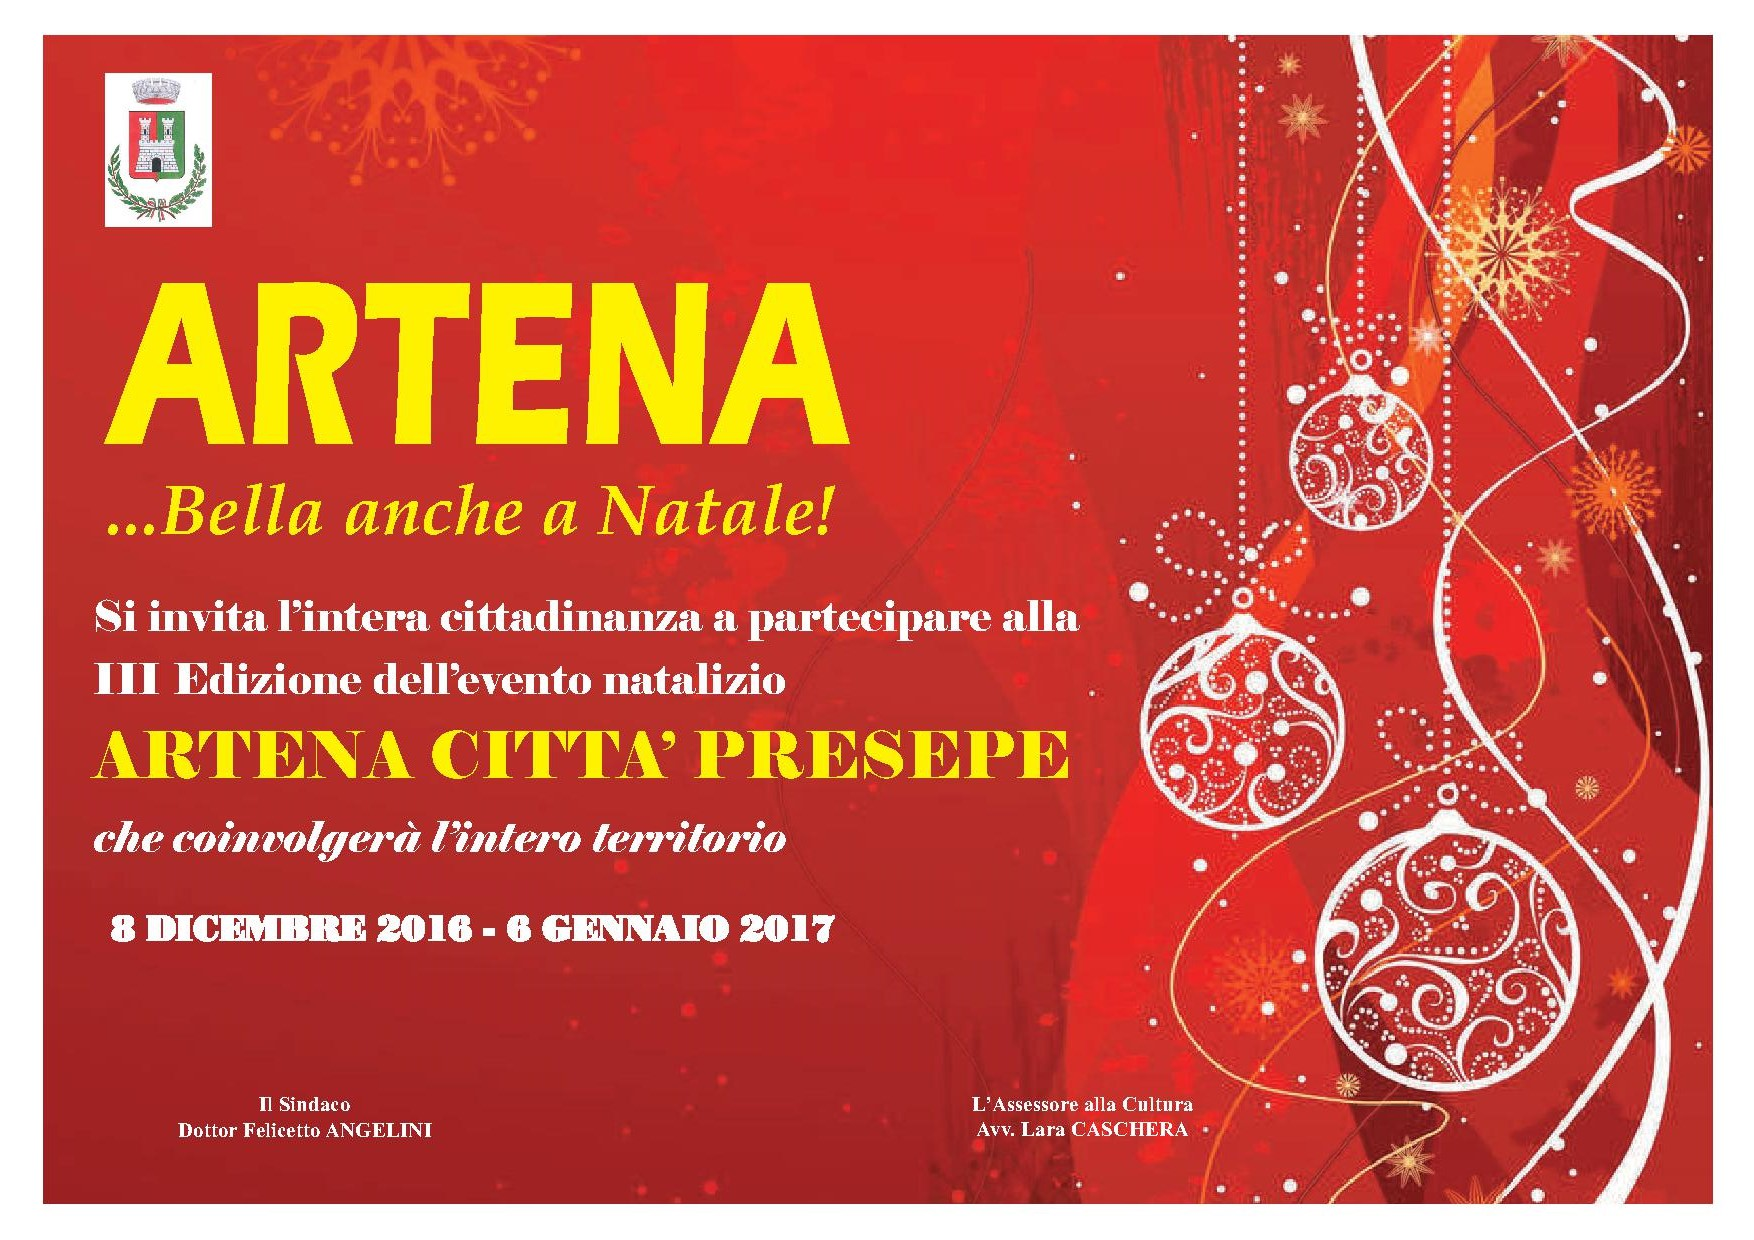 Natale ad Artena 2016 Città Presepe